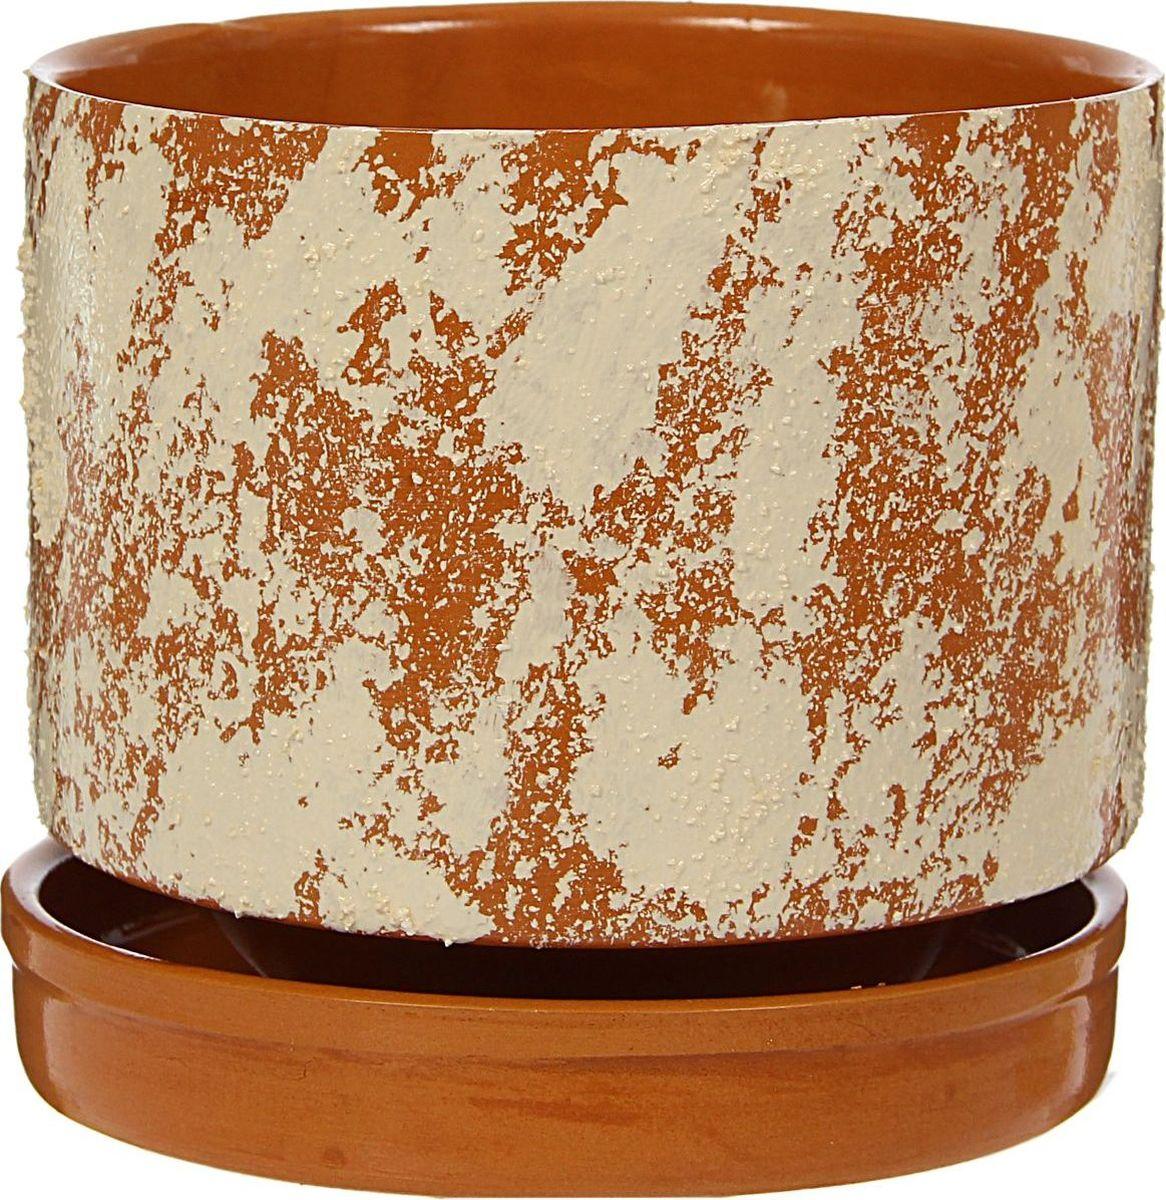 Кашпо Сильвия, цвет: бежевый, коричневый, 15 х 15 х 14 см1422018